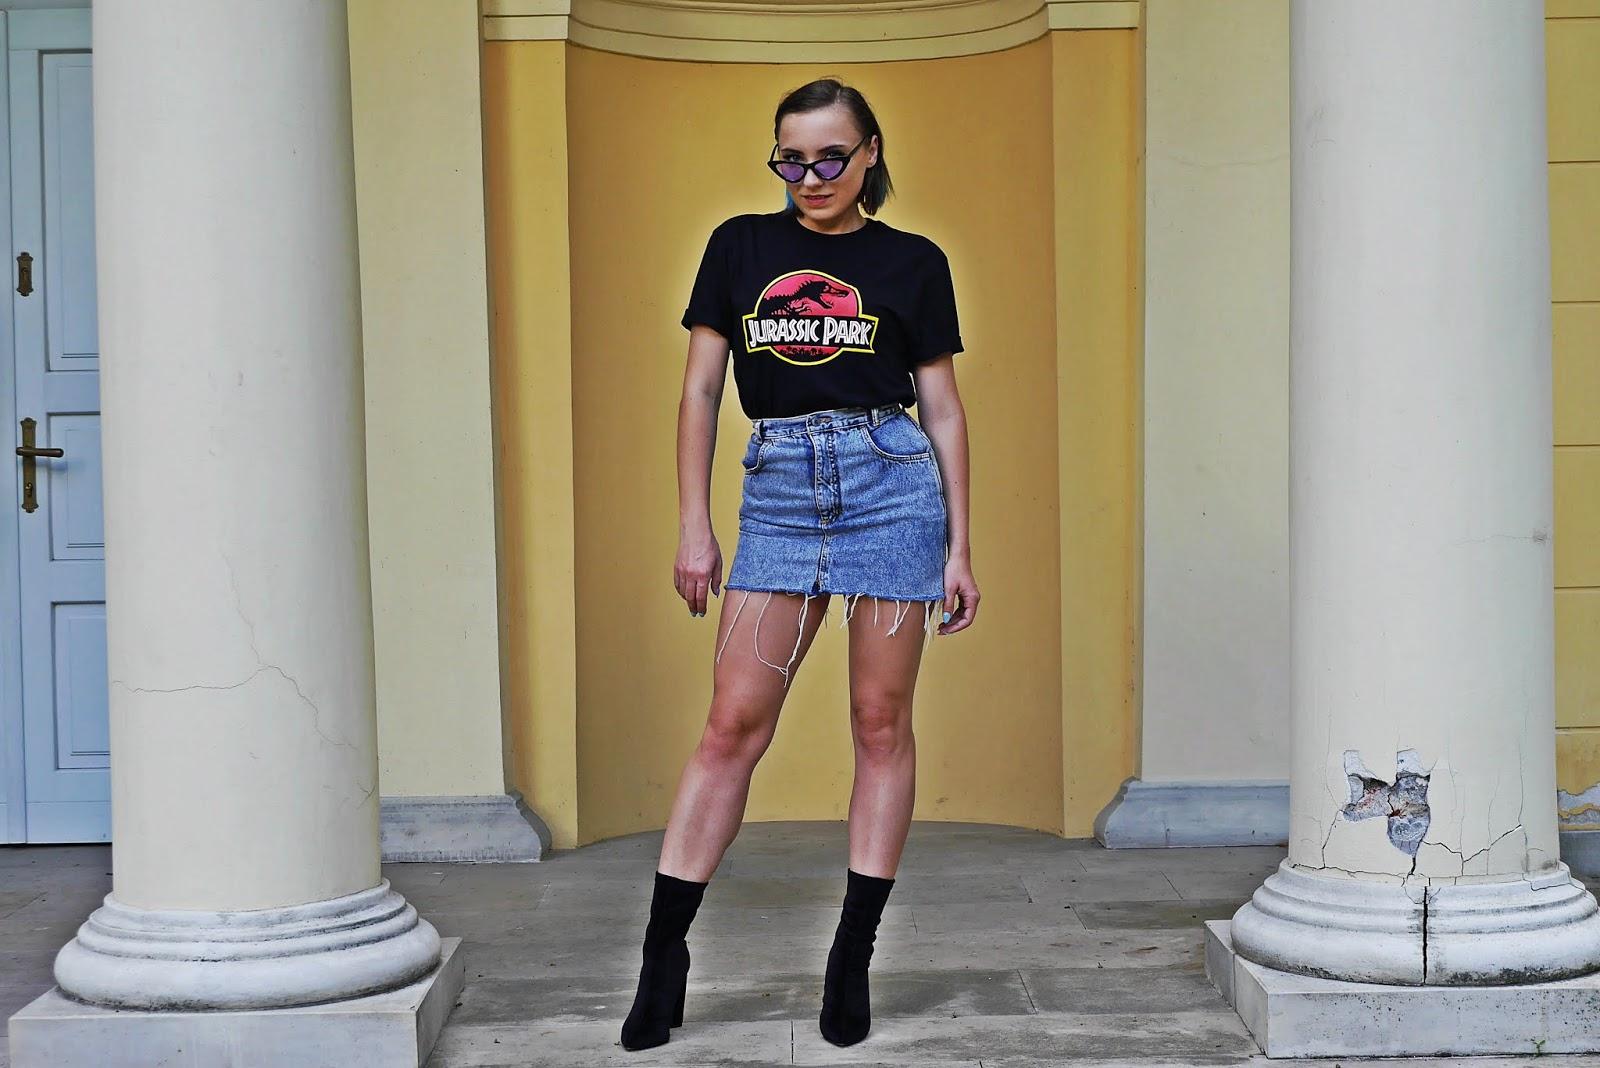 2_jurassic_park_t-hirt_spodnica_jeans_botki_skarpetki_renee_karyn_blog_modowy_080718